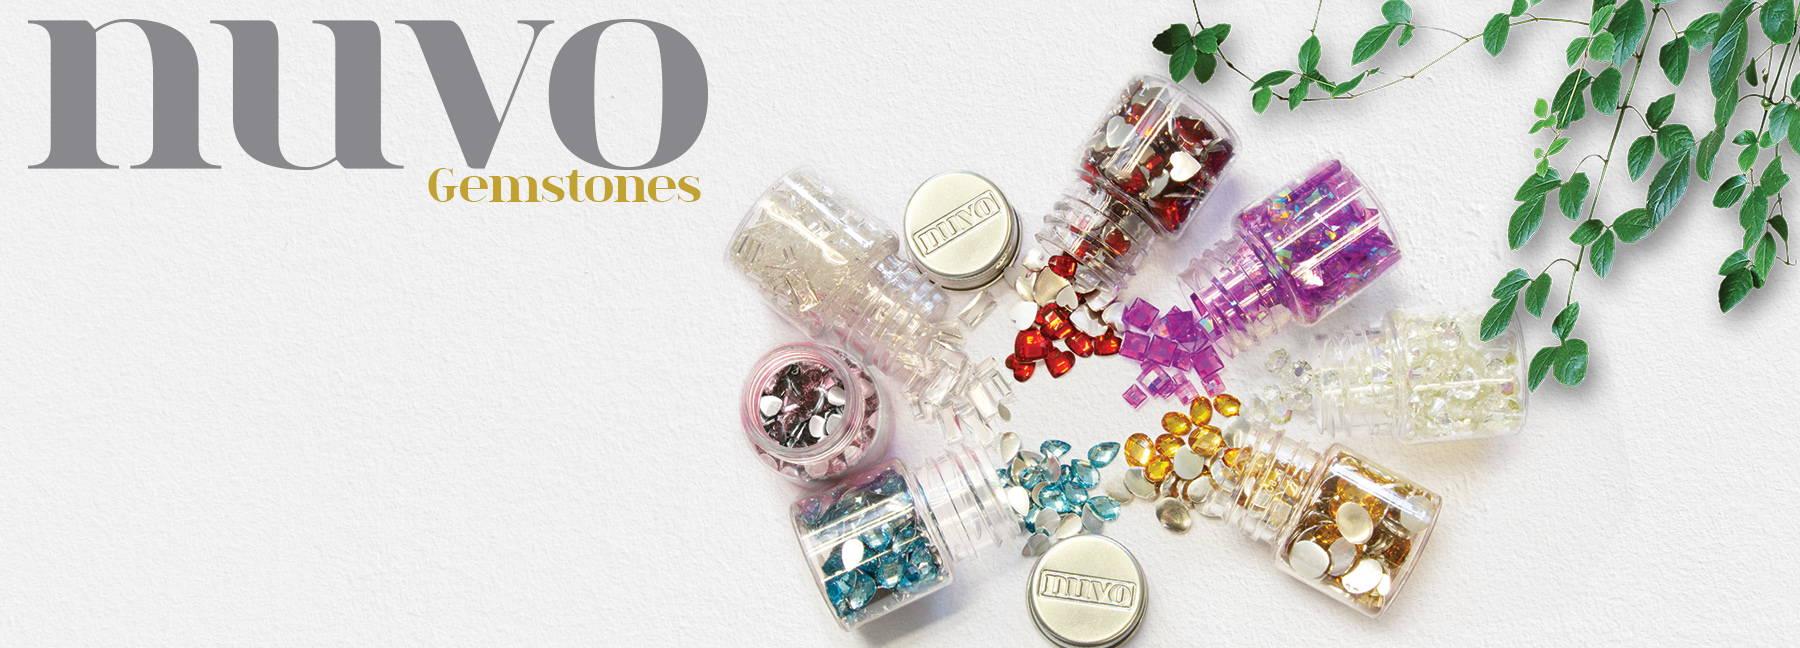 Nuvo Pure Sheen Gemstones Silver Petals에 대한 이미지 검색결과